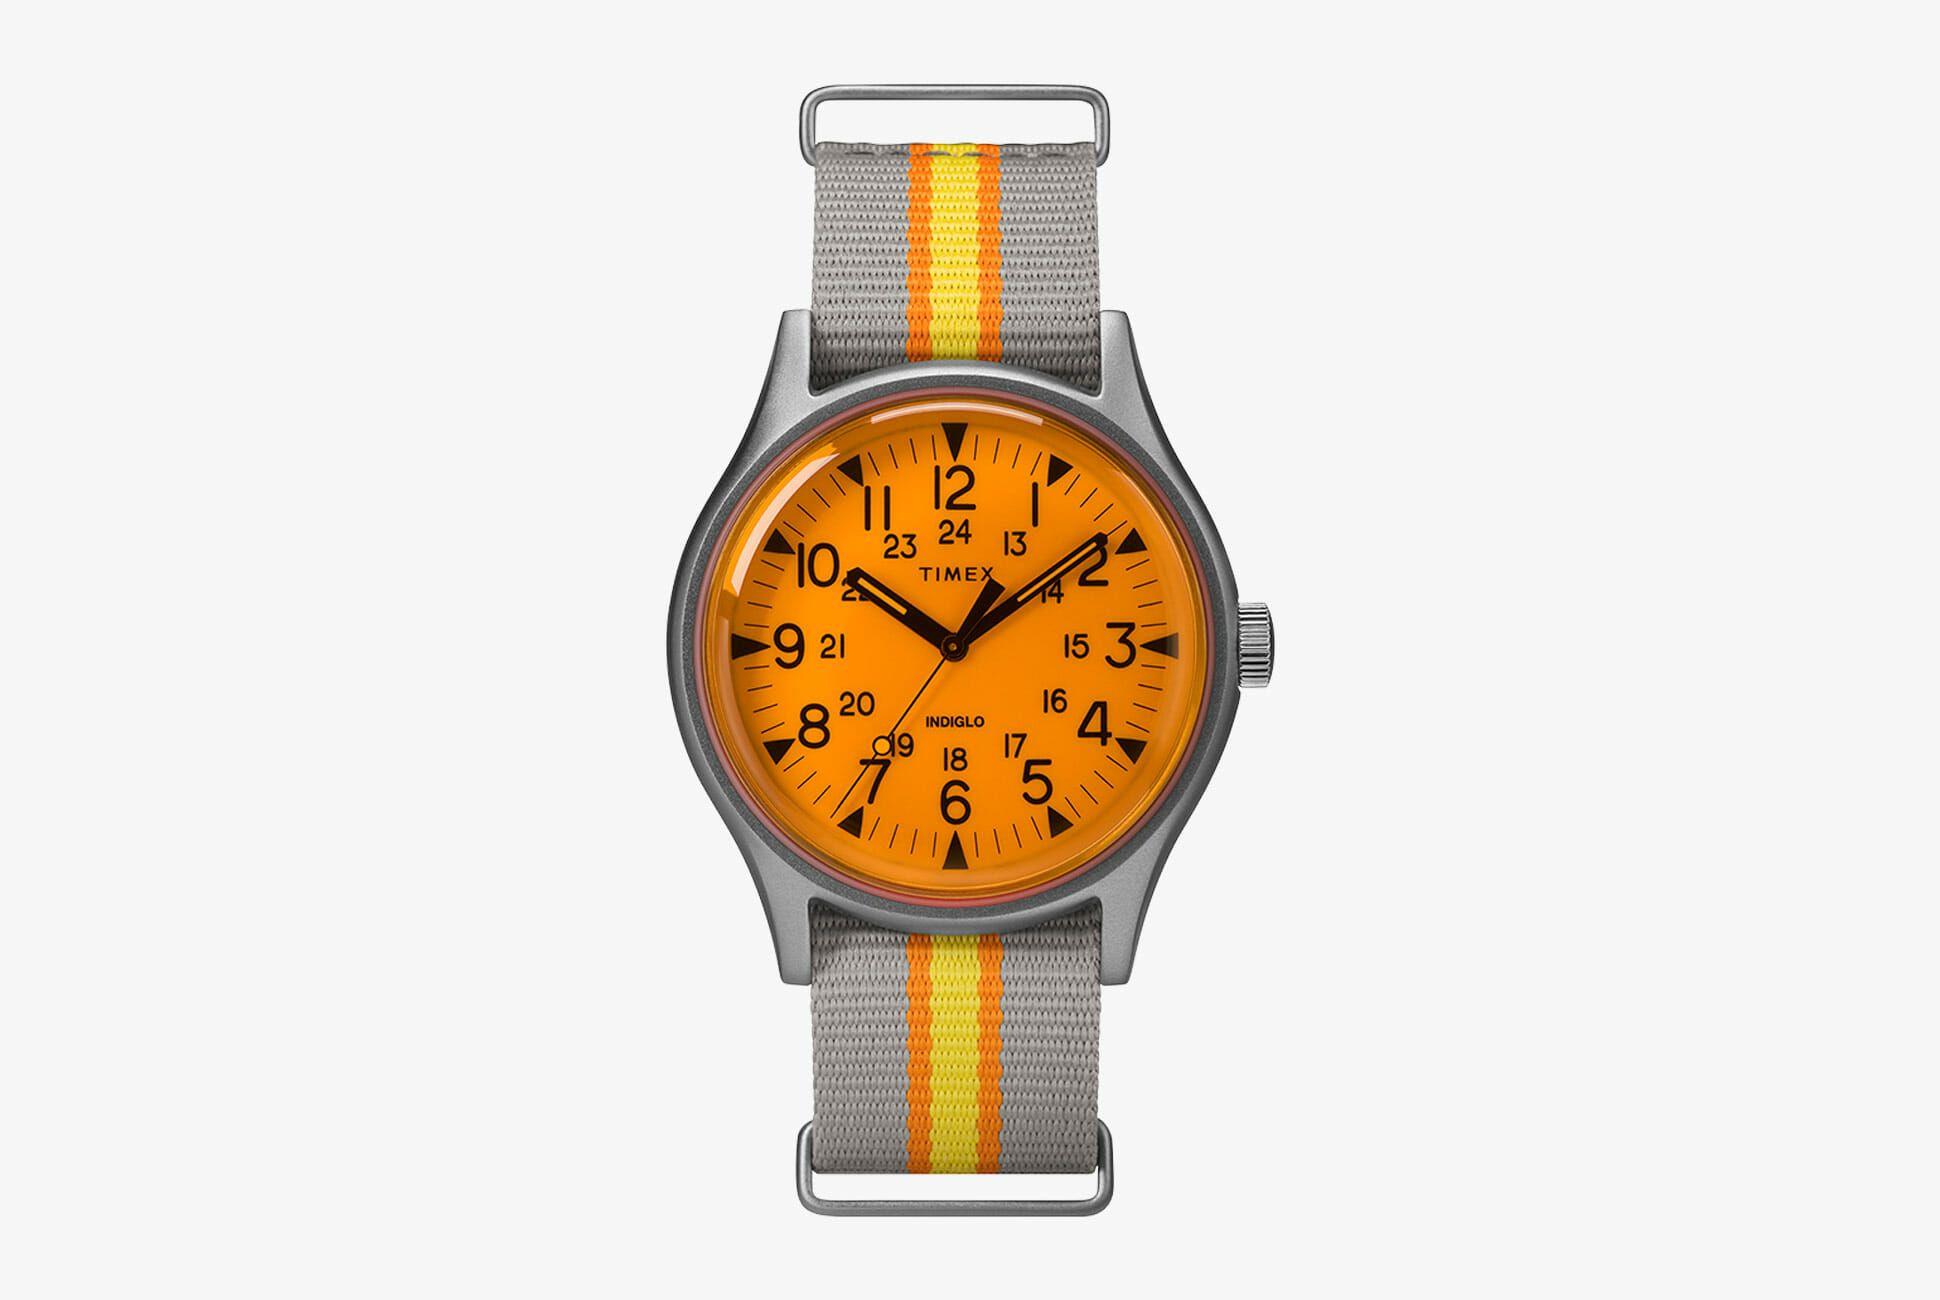 Timex-California-Deal-Gear-Patrol-Slide-2